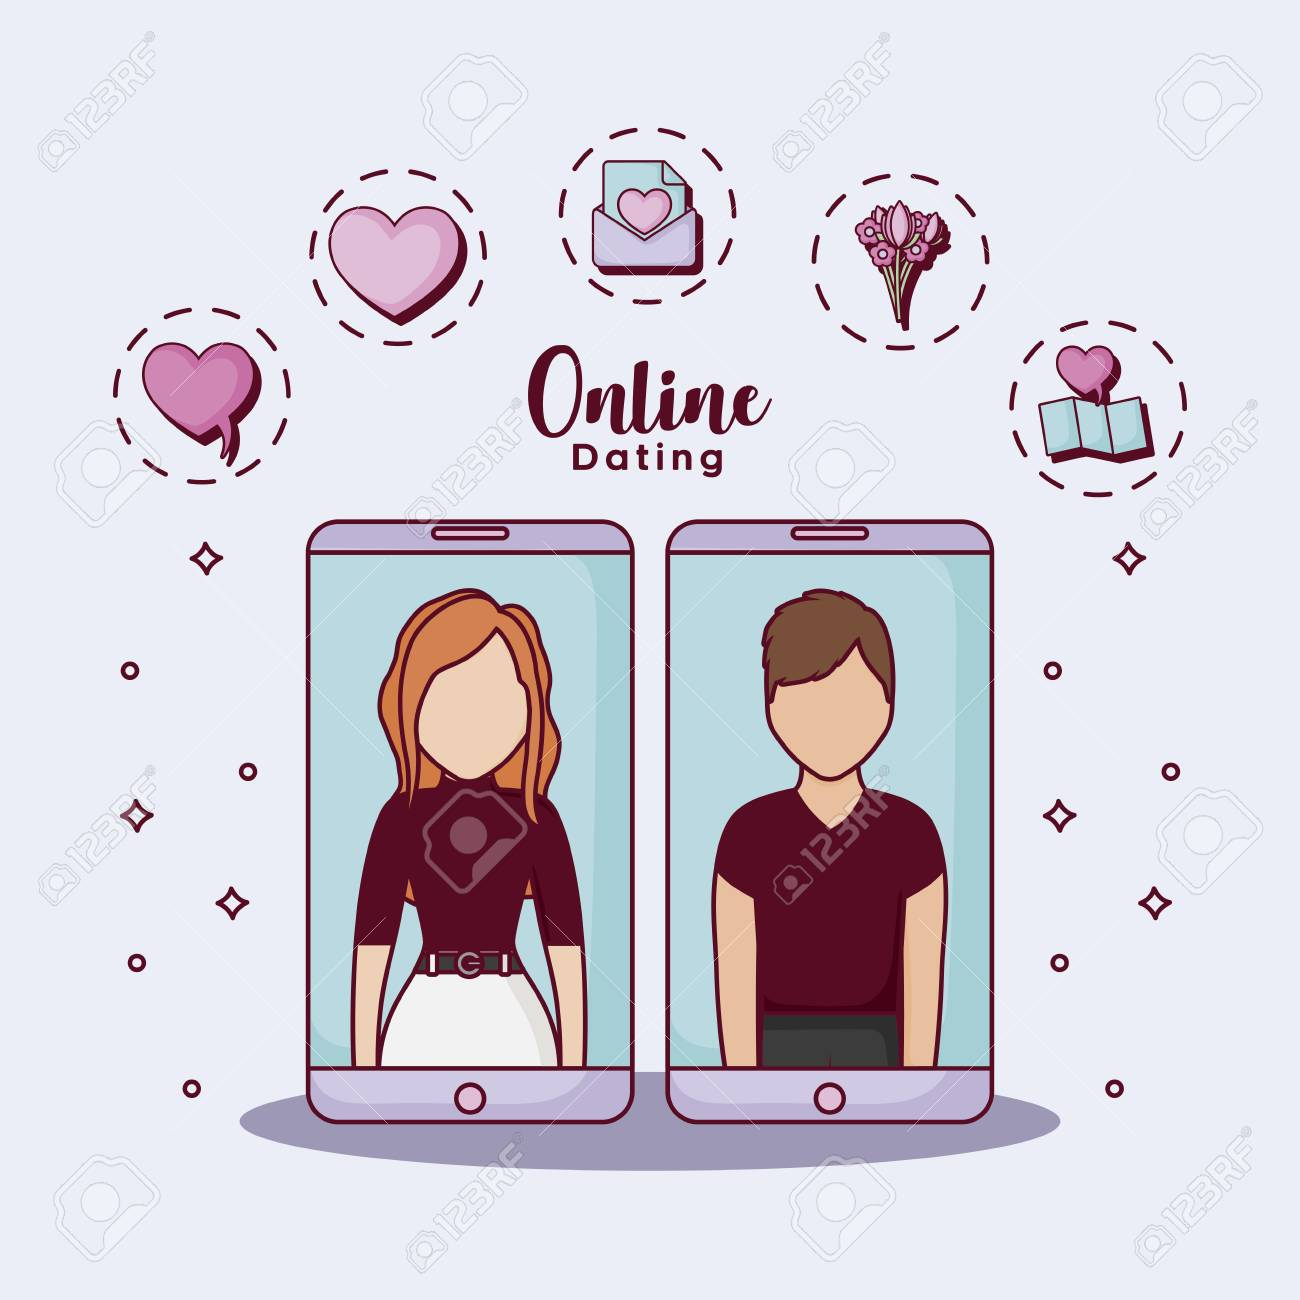 avatar dating verkossa dating kysymykset punertava